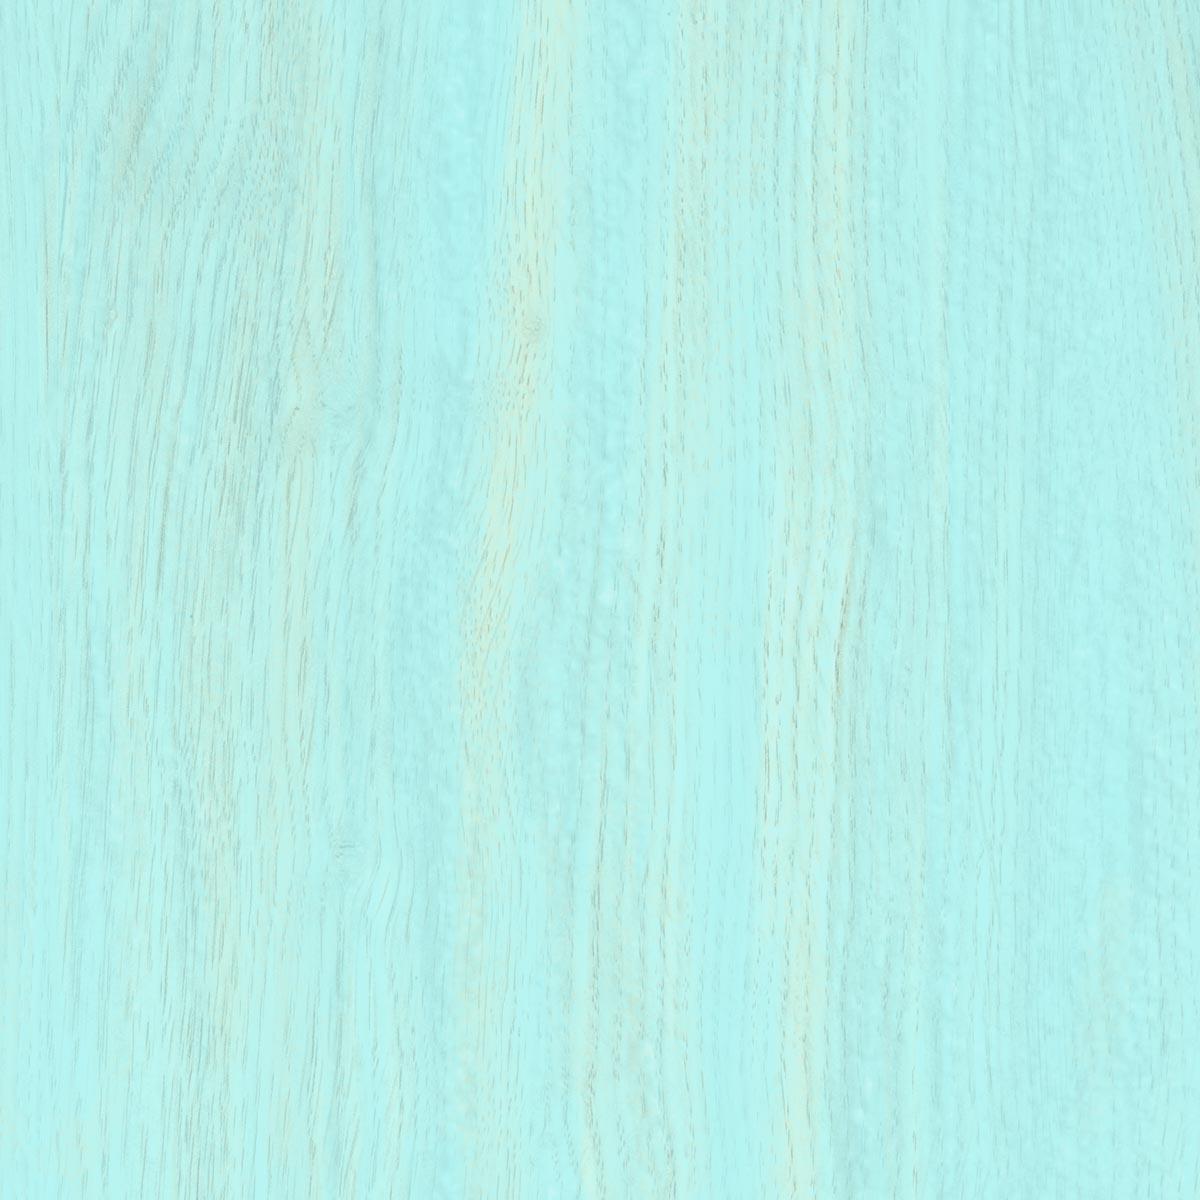 FolkArt ® Pickling Wash™ - Sea Glass, 2 oz.